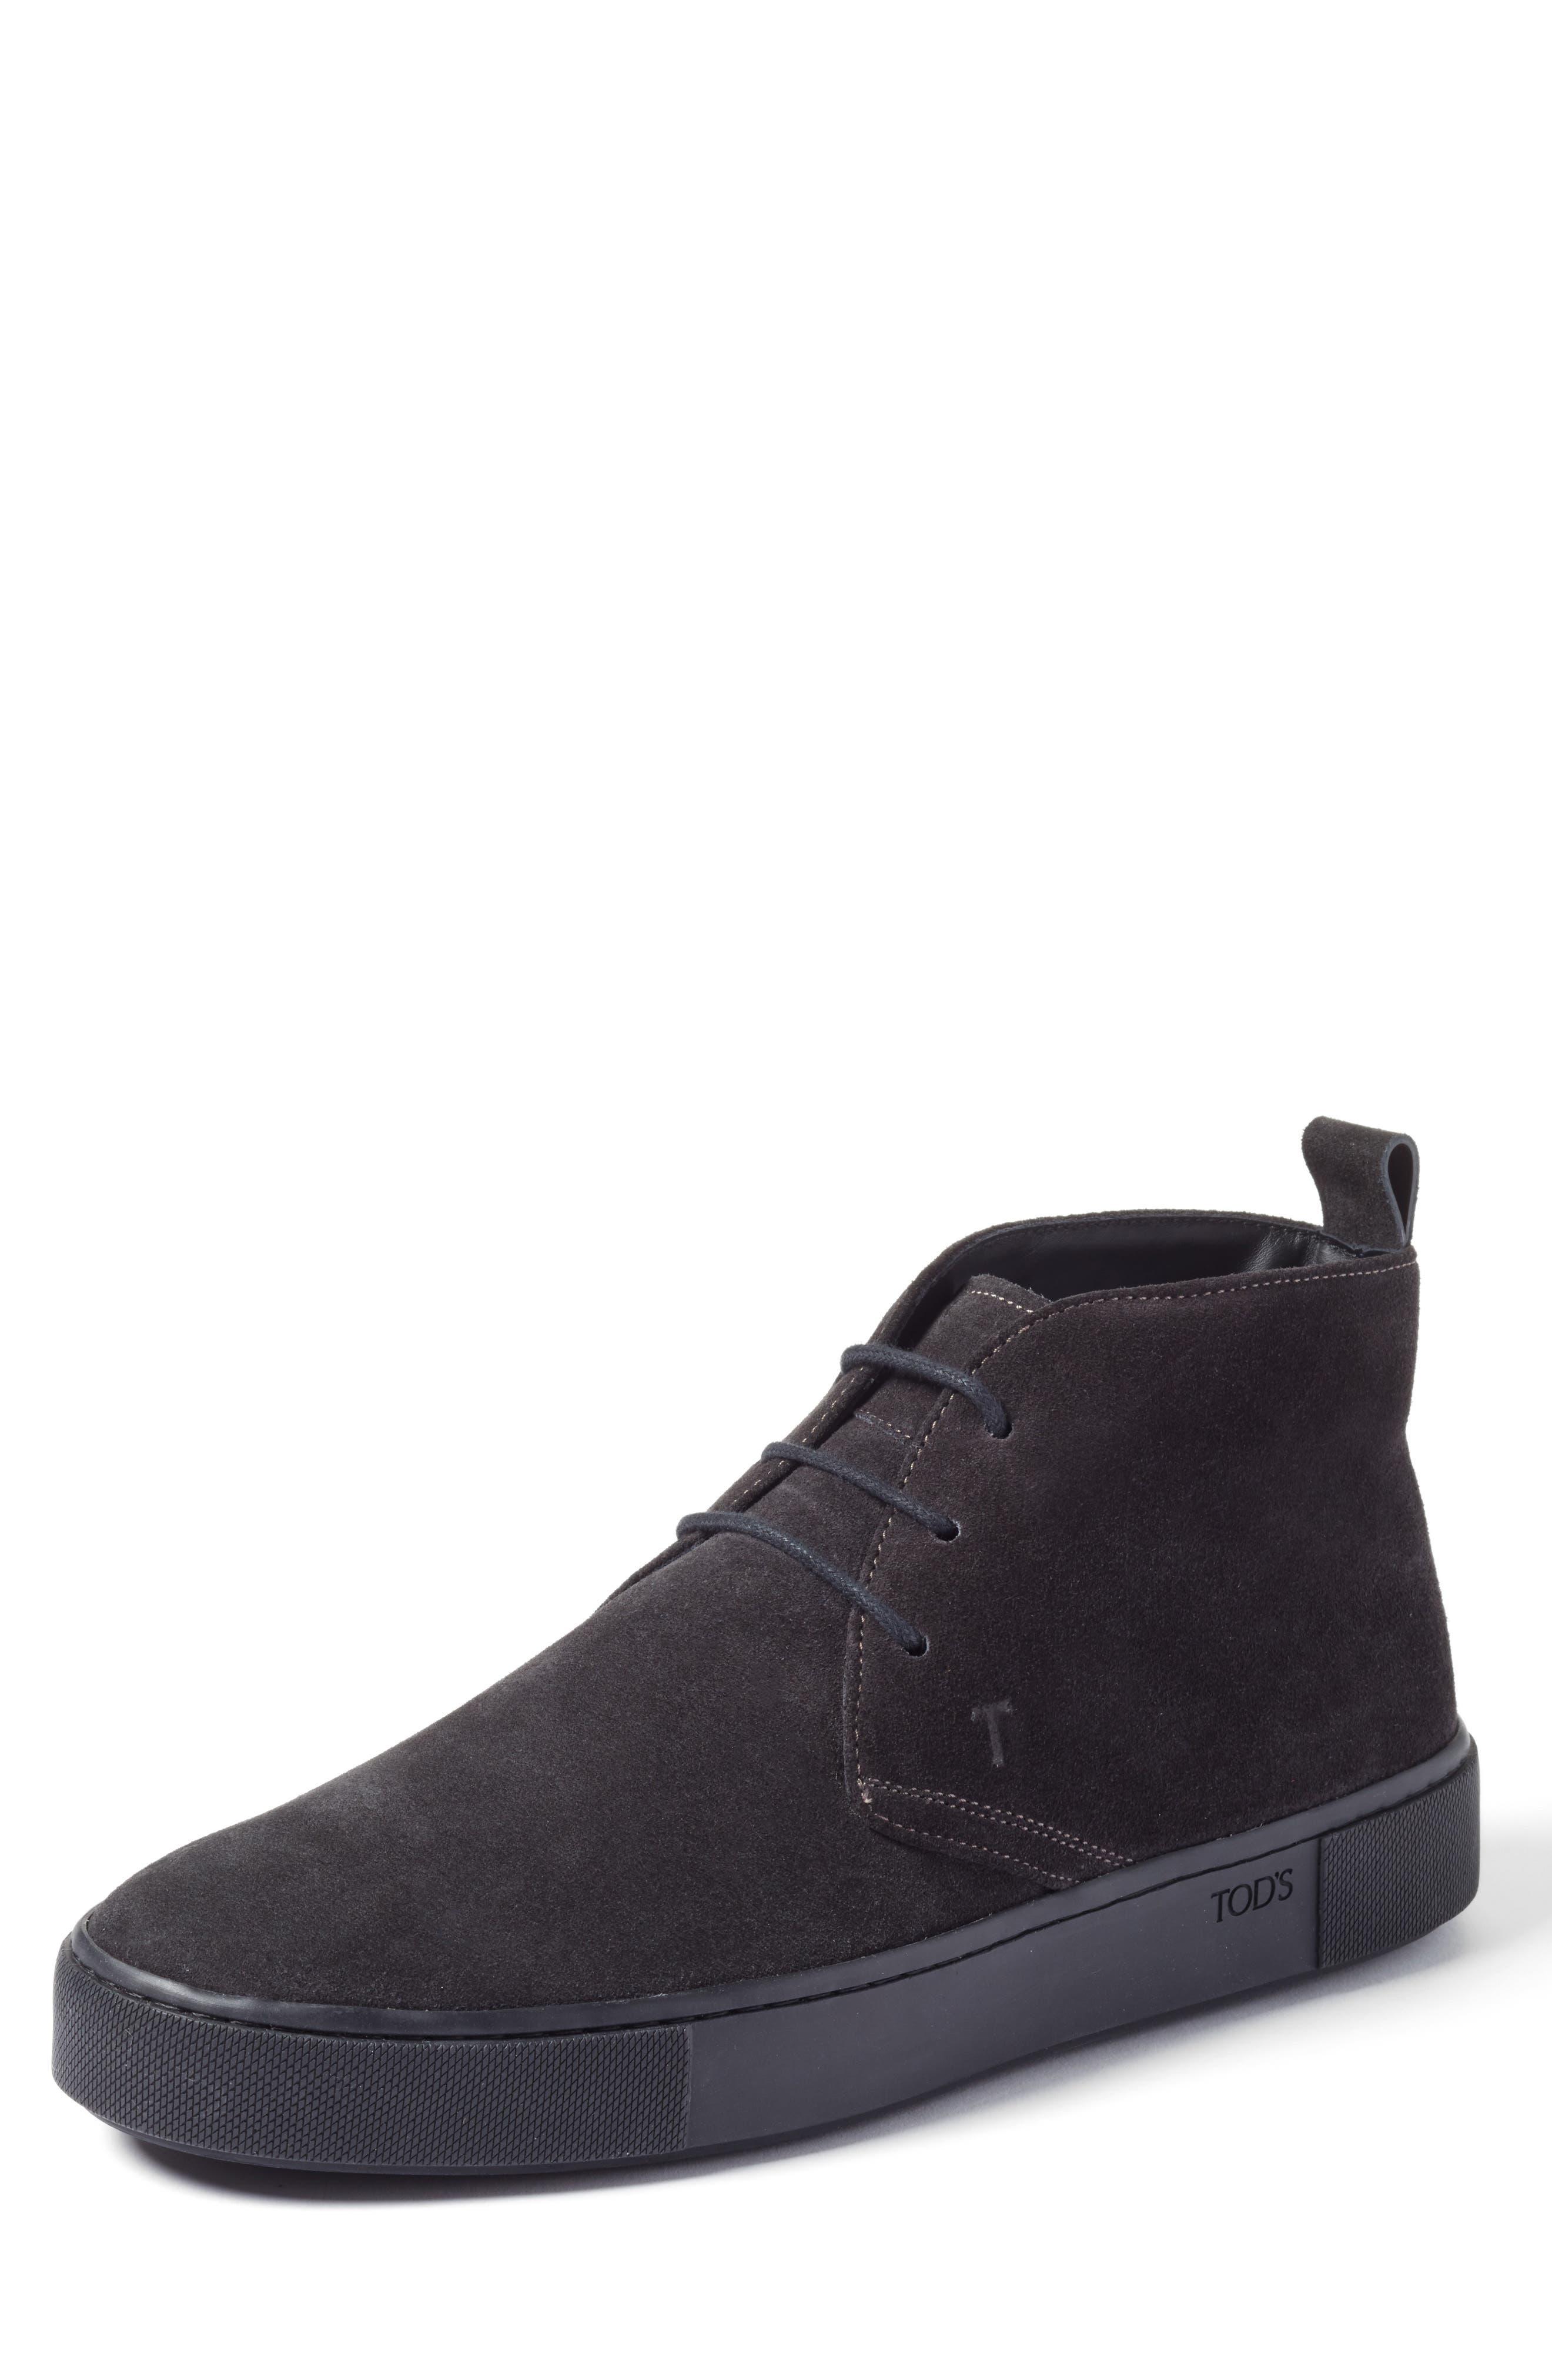 Leather Chukka Boot,                         Main,                         color, 020